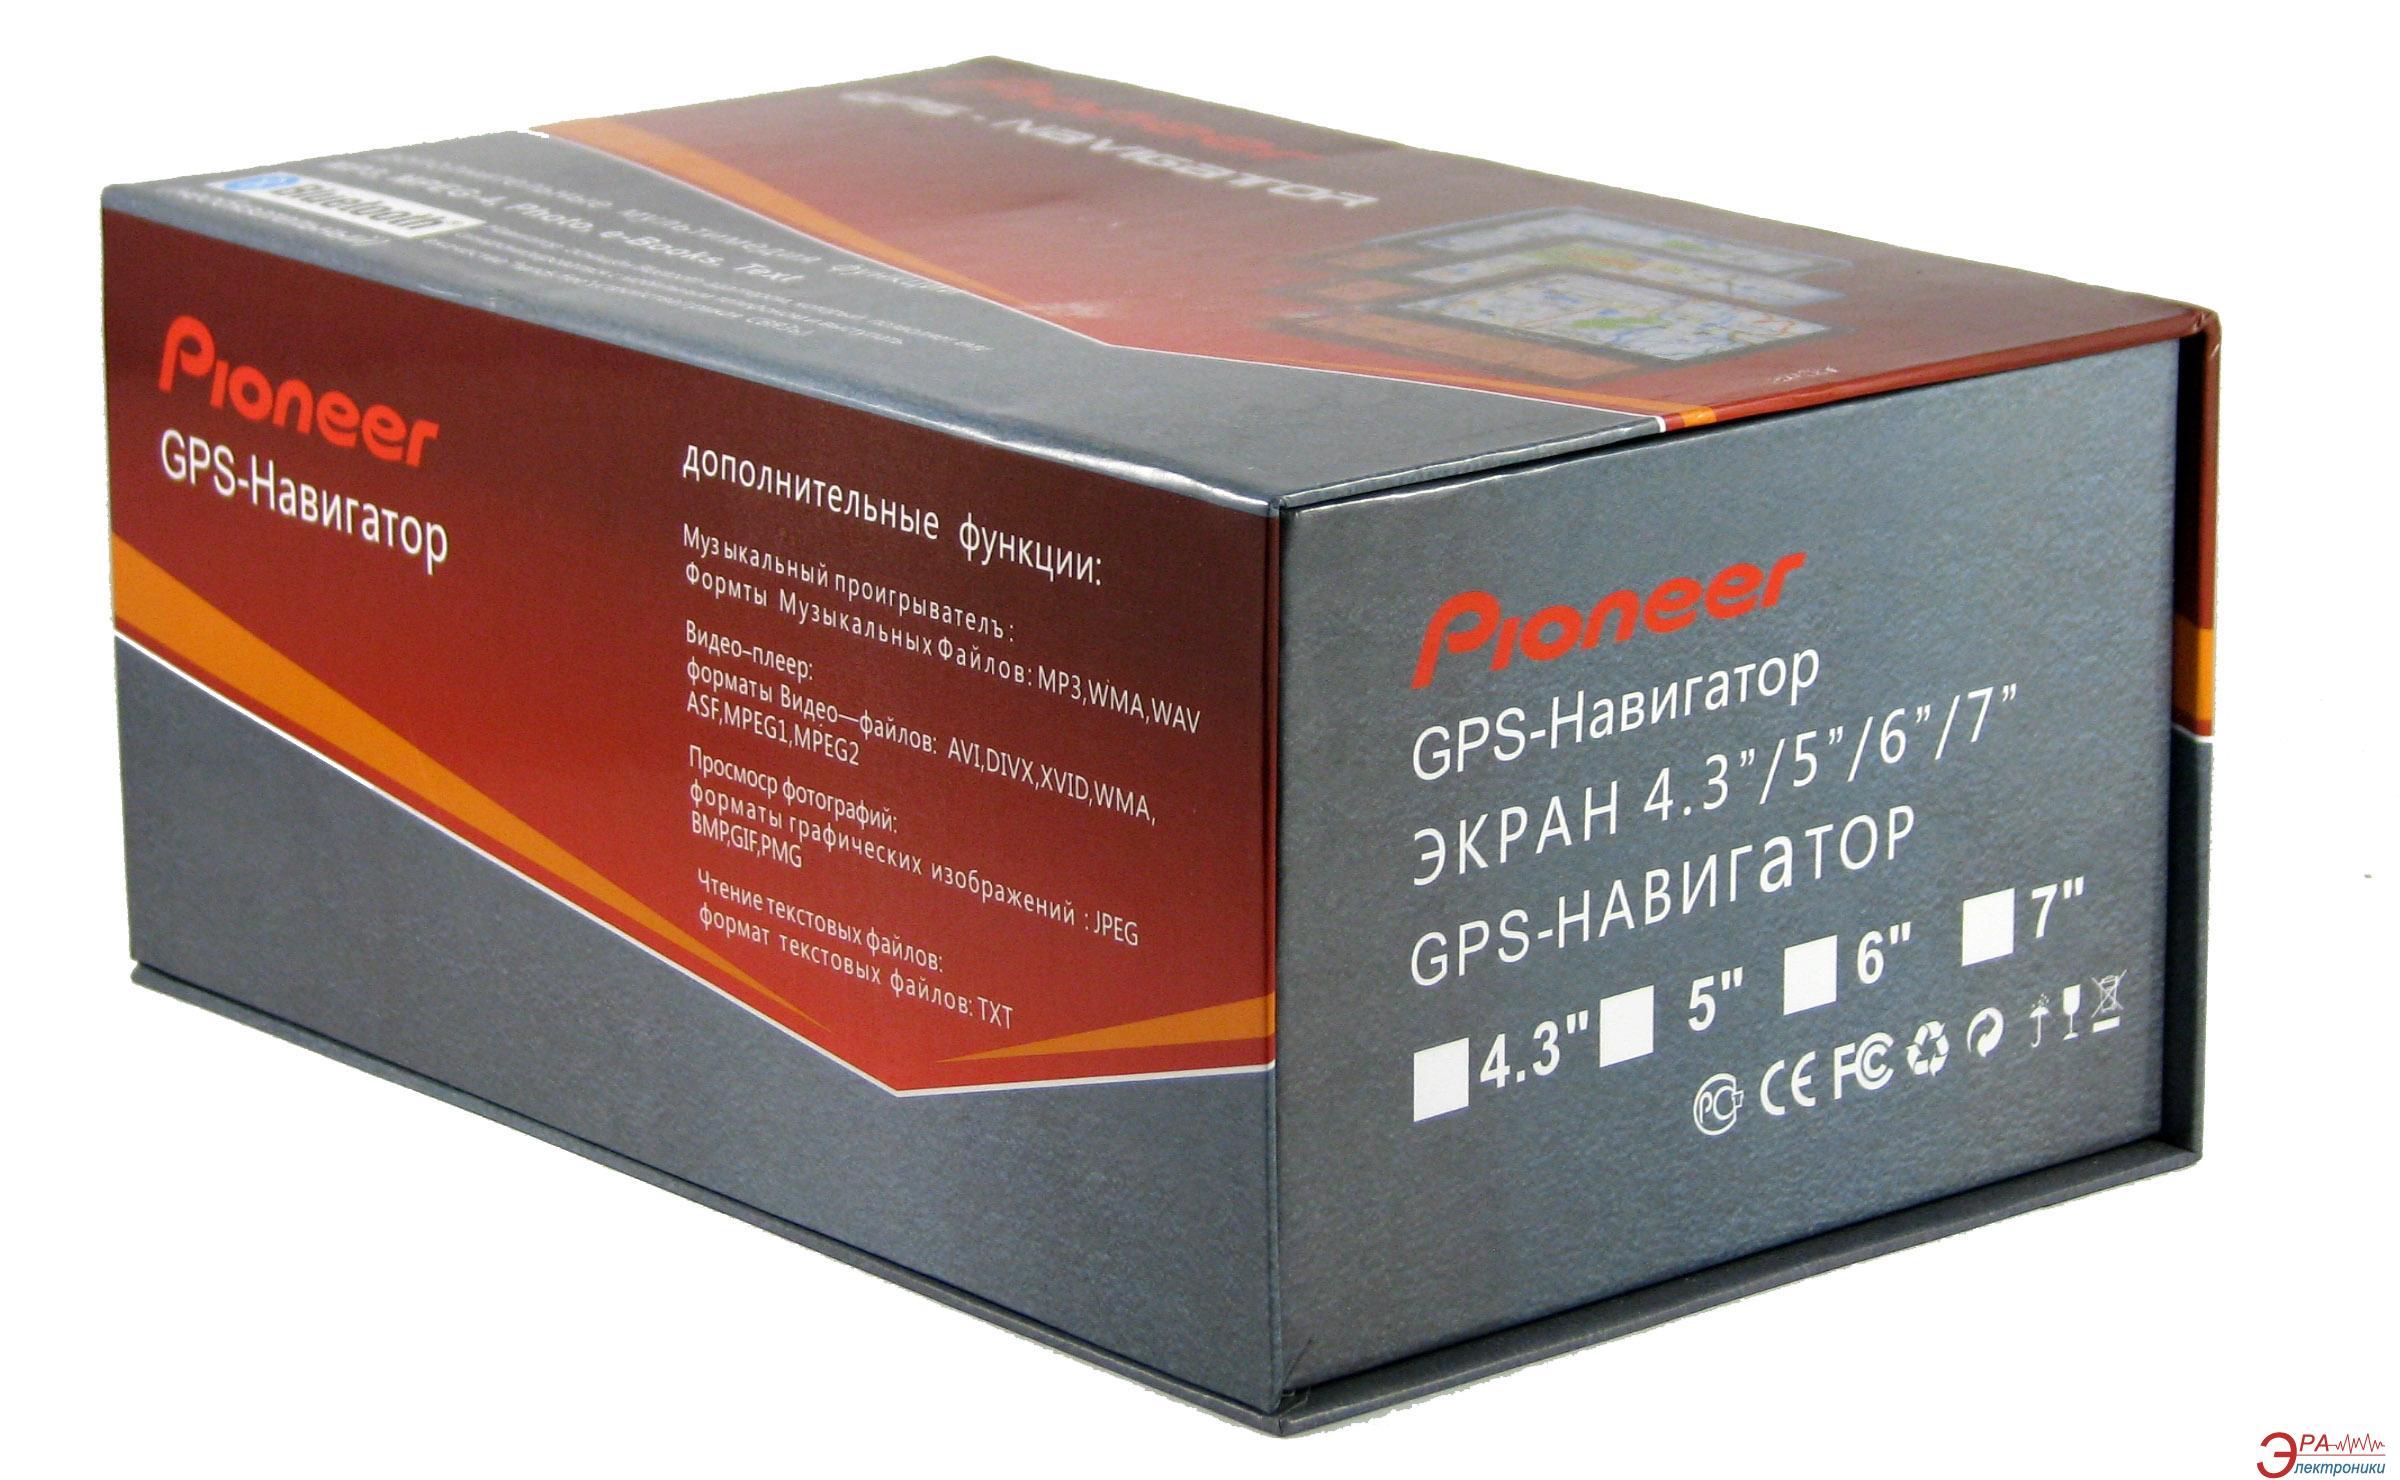 GPS-навигатор Pioneer 5002